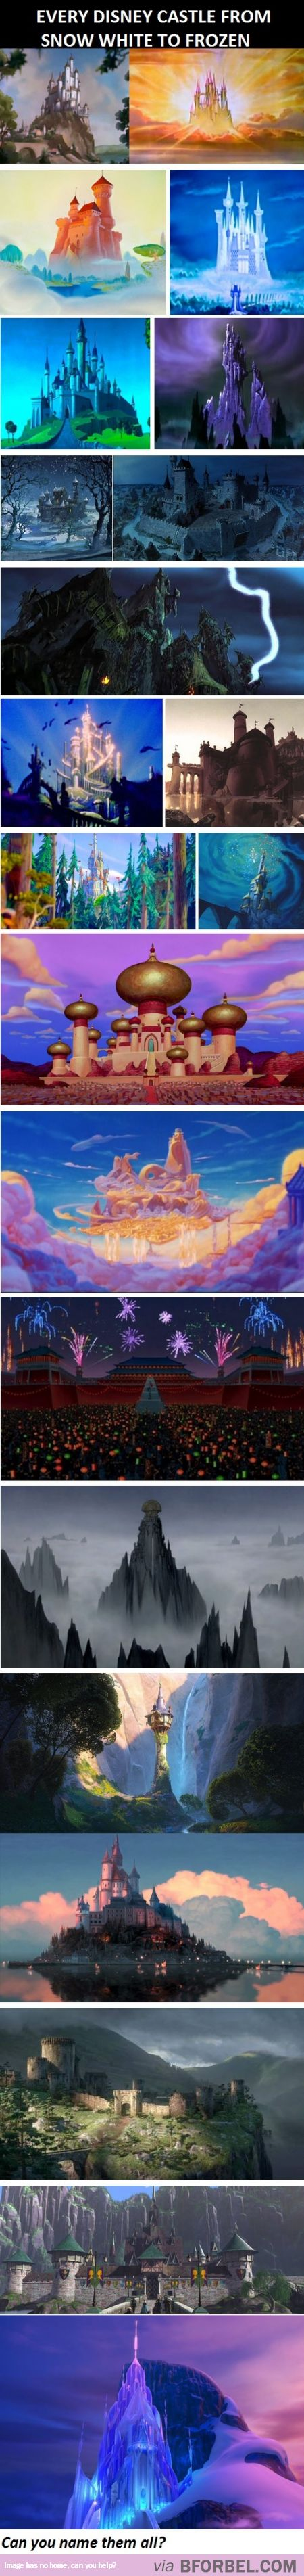 22 Disney Castles Across Time